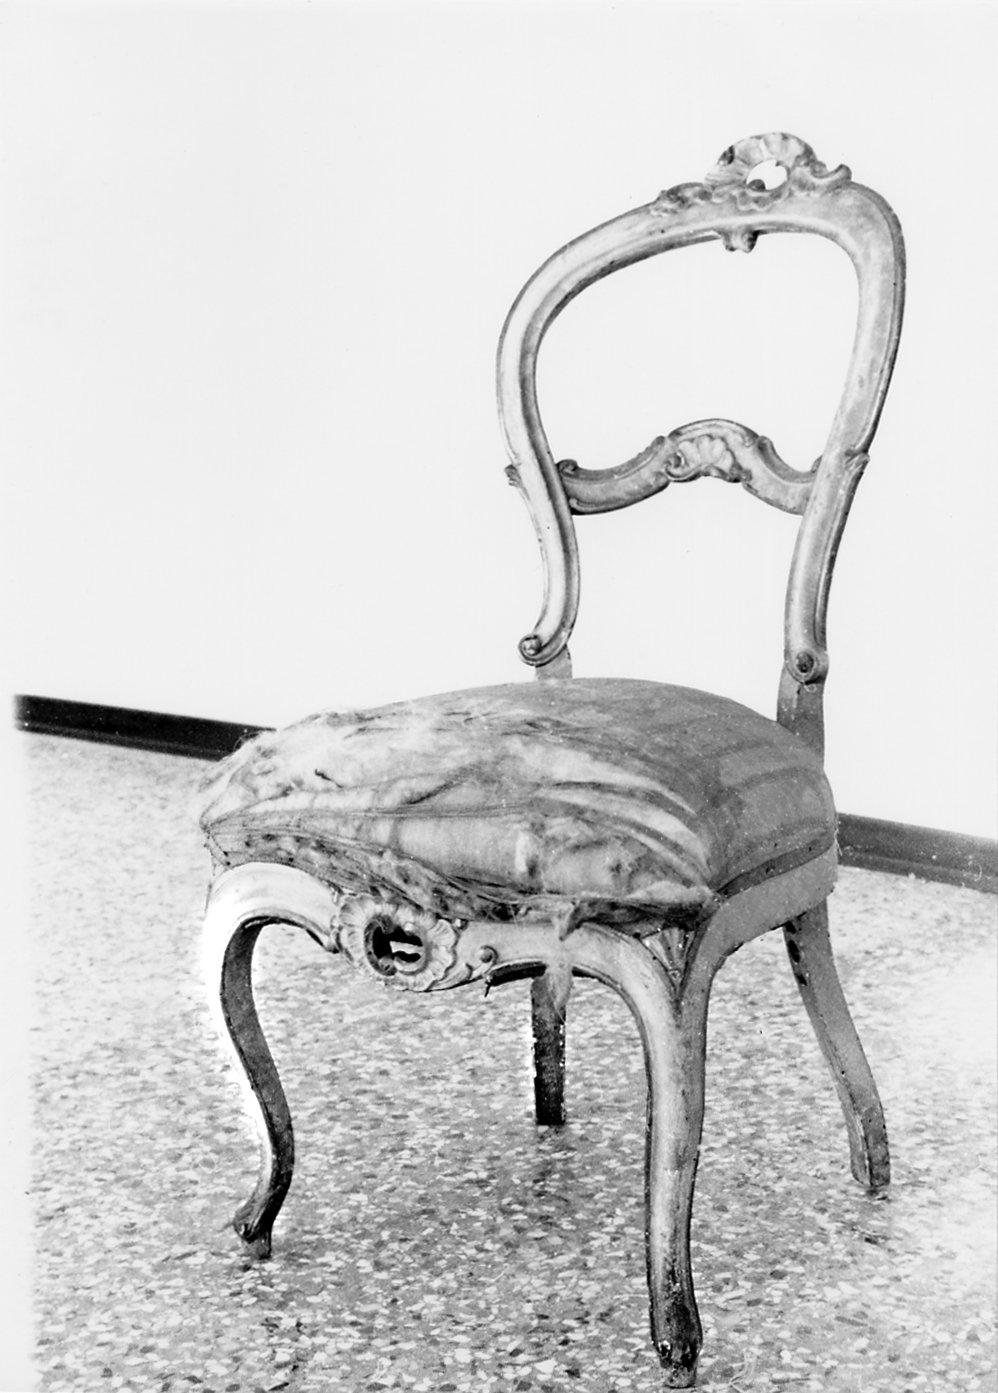 sedia, opera isolata - manifattura lombardo-veneta (metà sec. XIX)